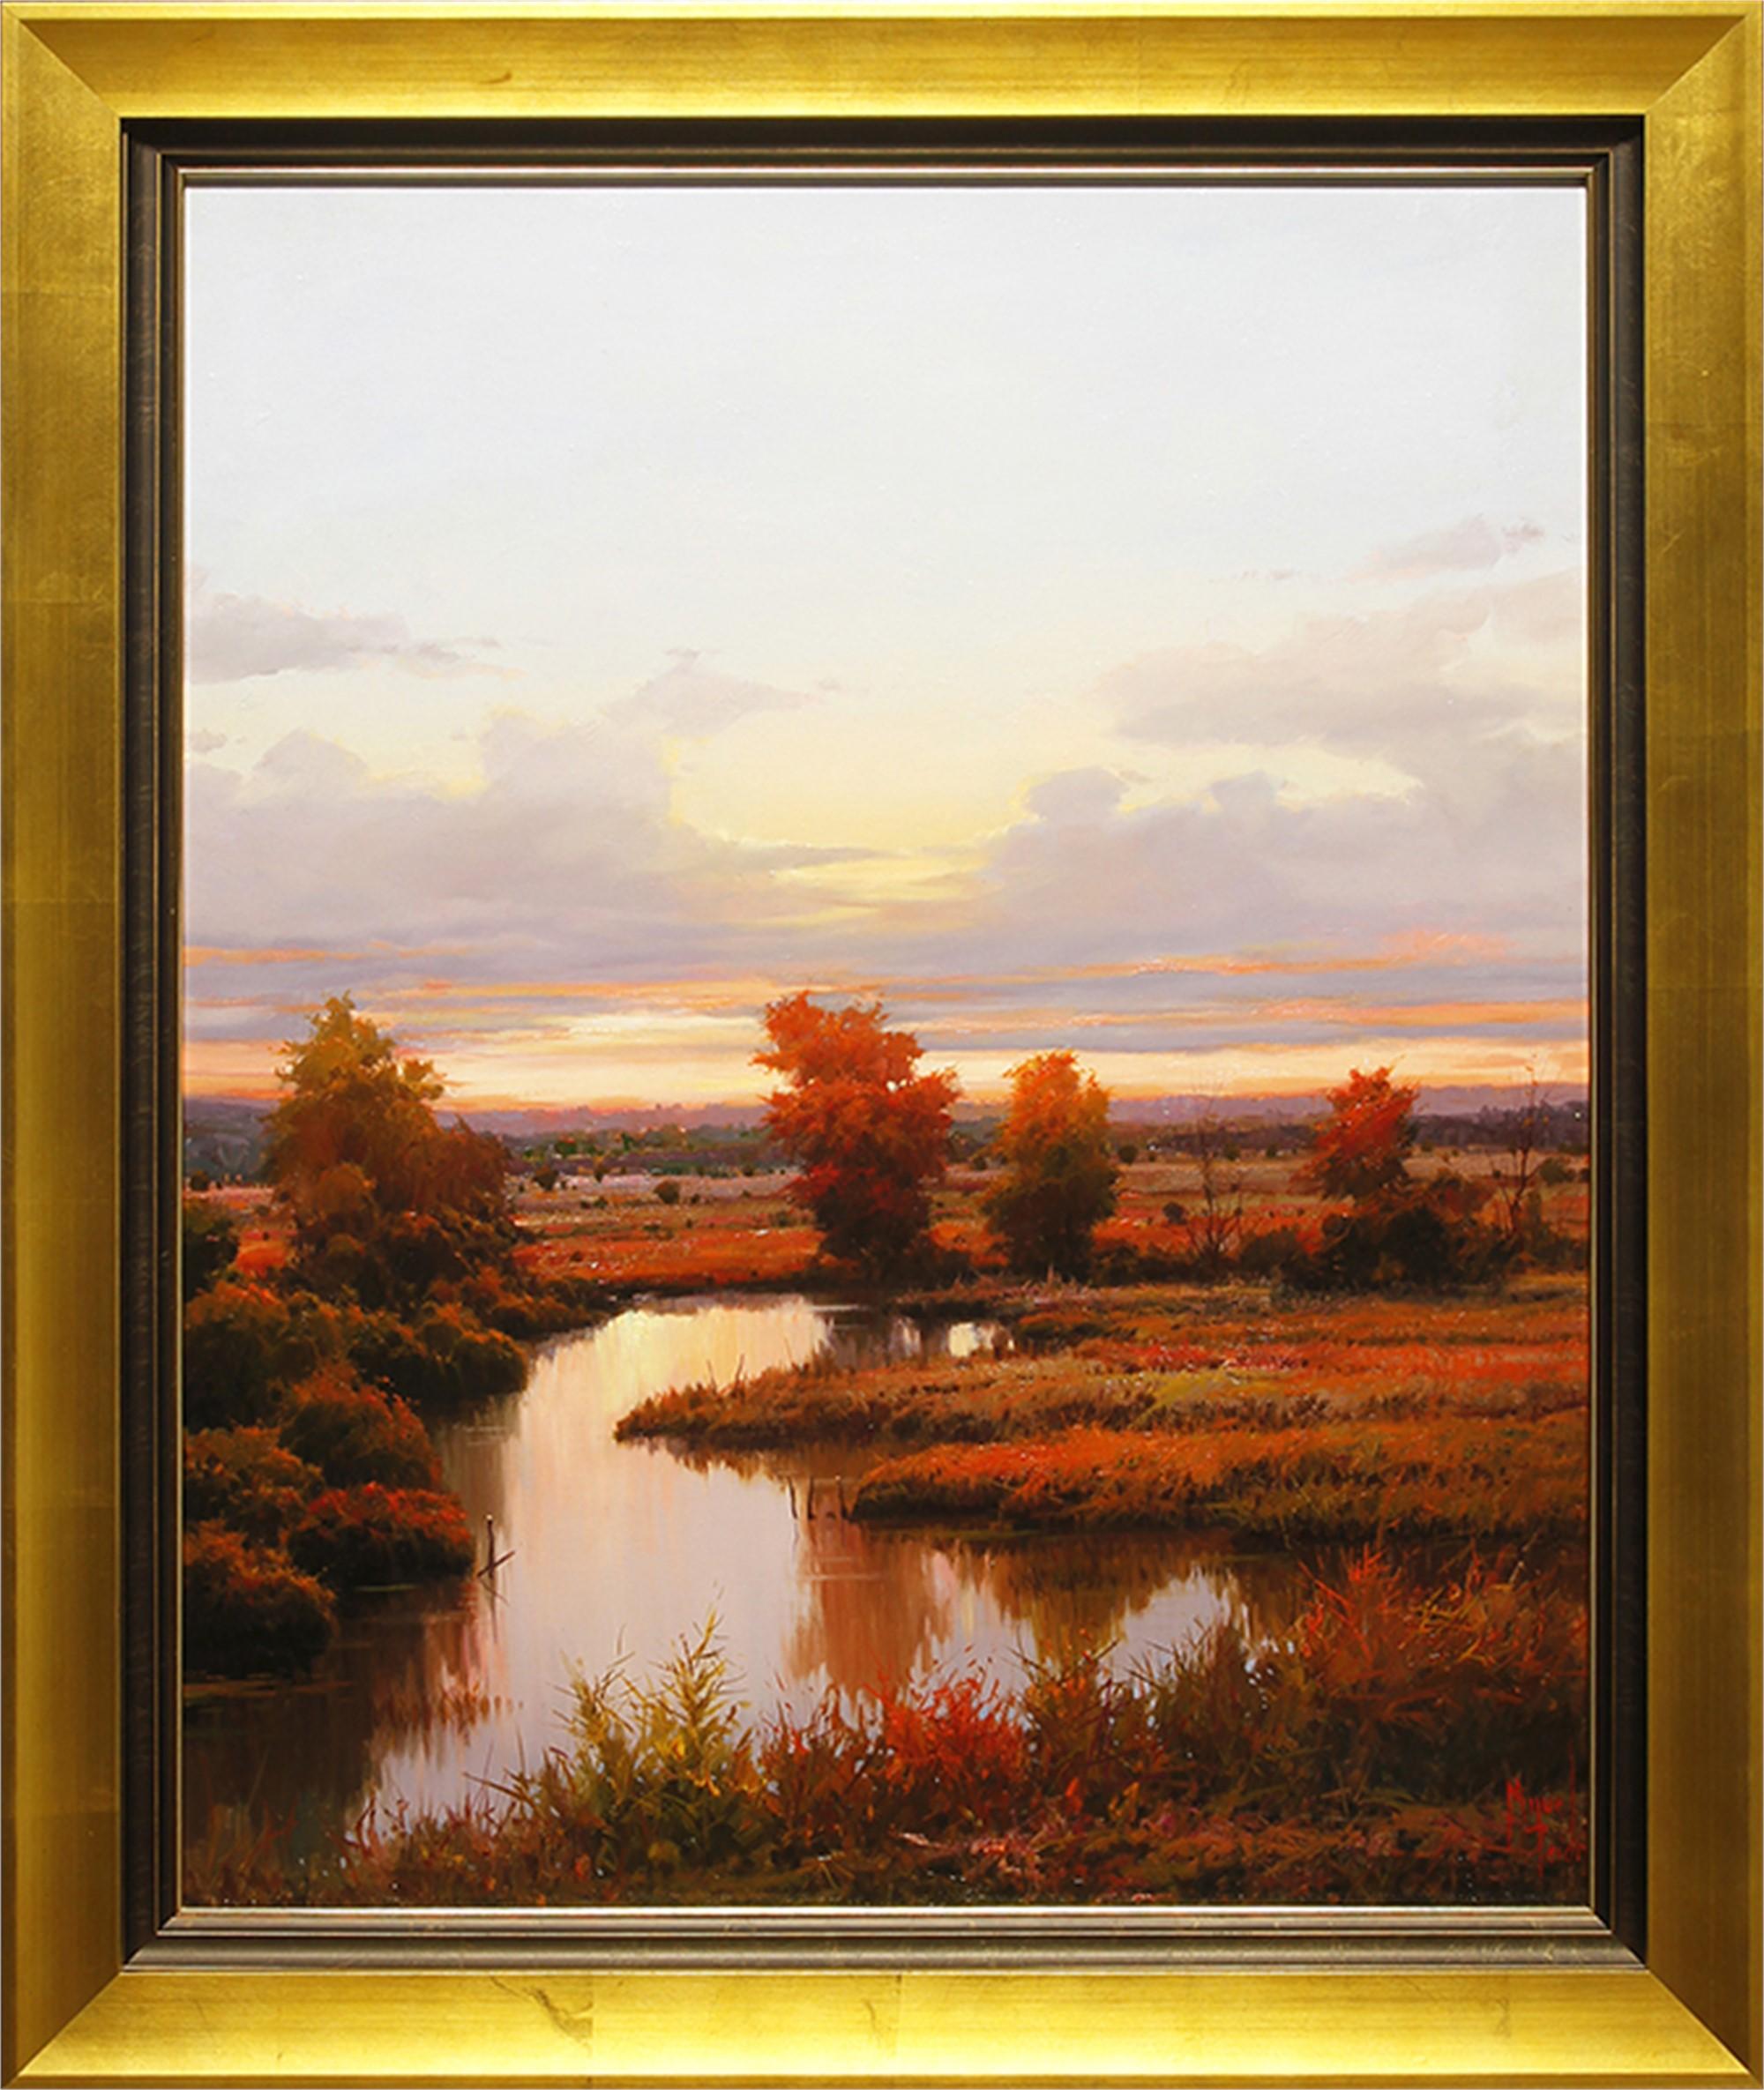 Amanecer Calido (Tranquil Dawn) by Miguel Peidro